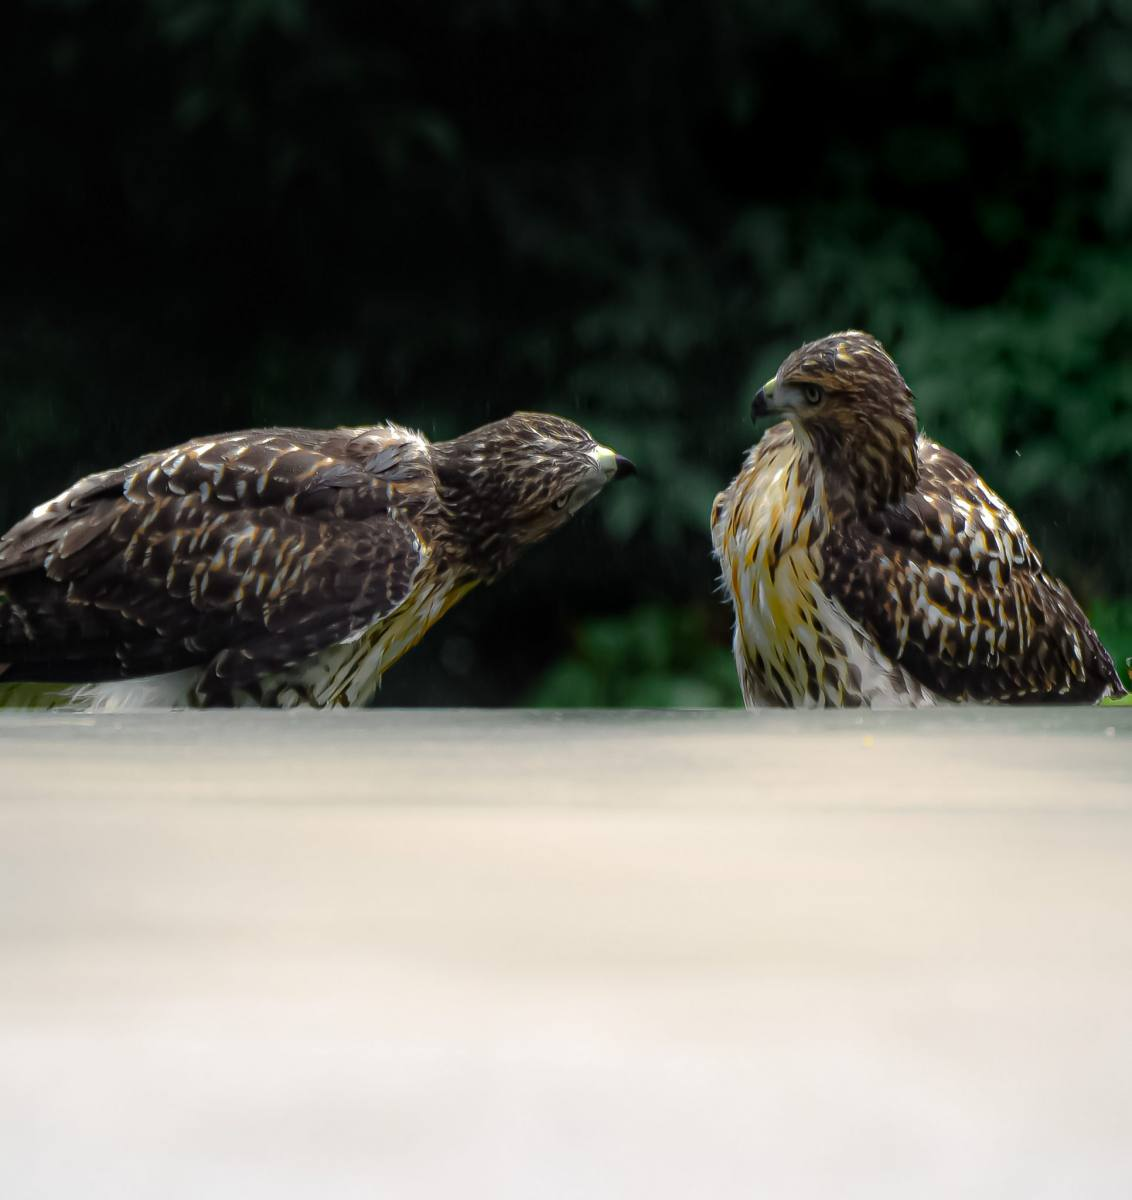 Red-tailed Hawks By Shrishti Joshi